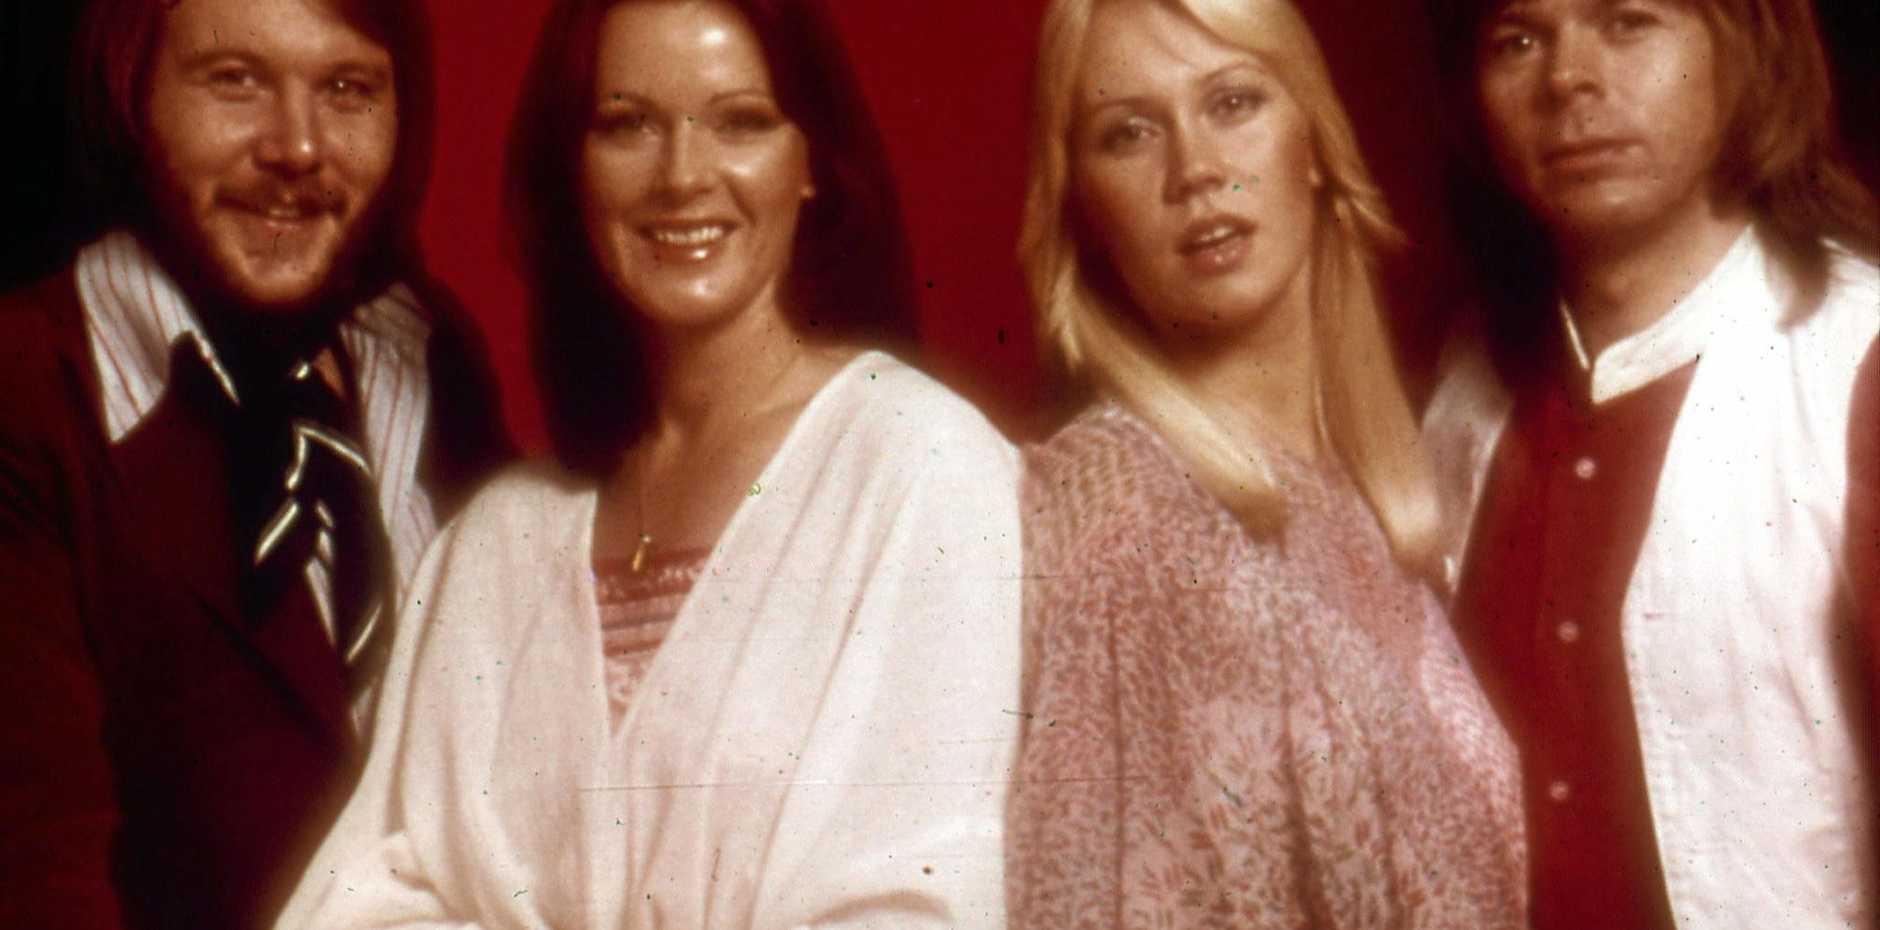 Benny Anderson, Annifrid Lyngstad, Agnetha Faltskog, and Bjorn Ulvaeus in 1977.